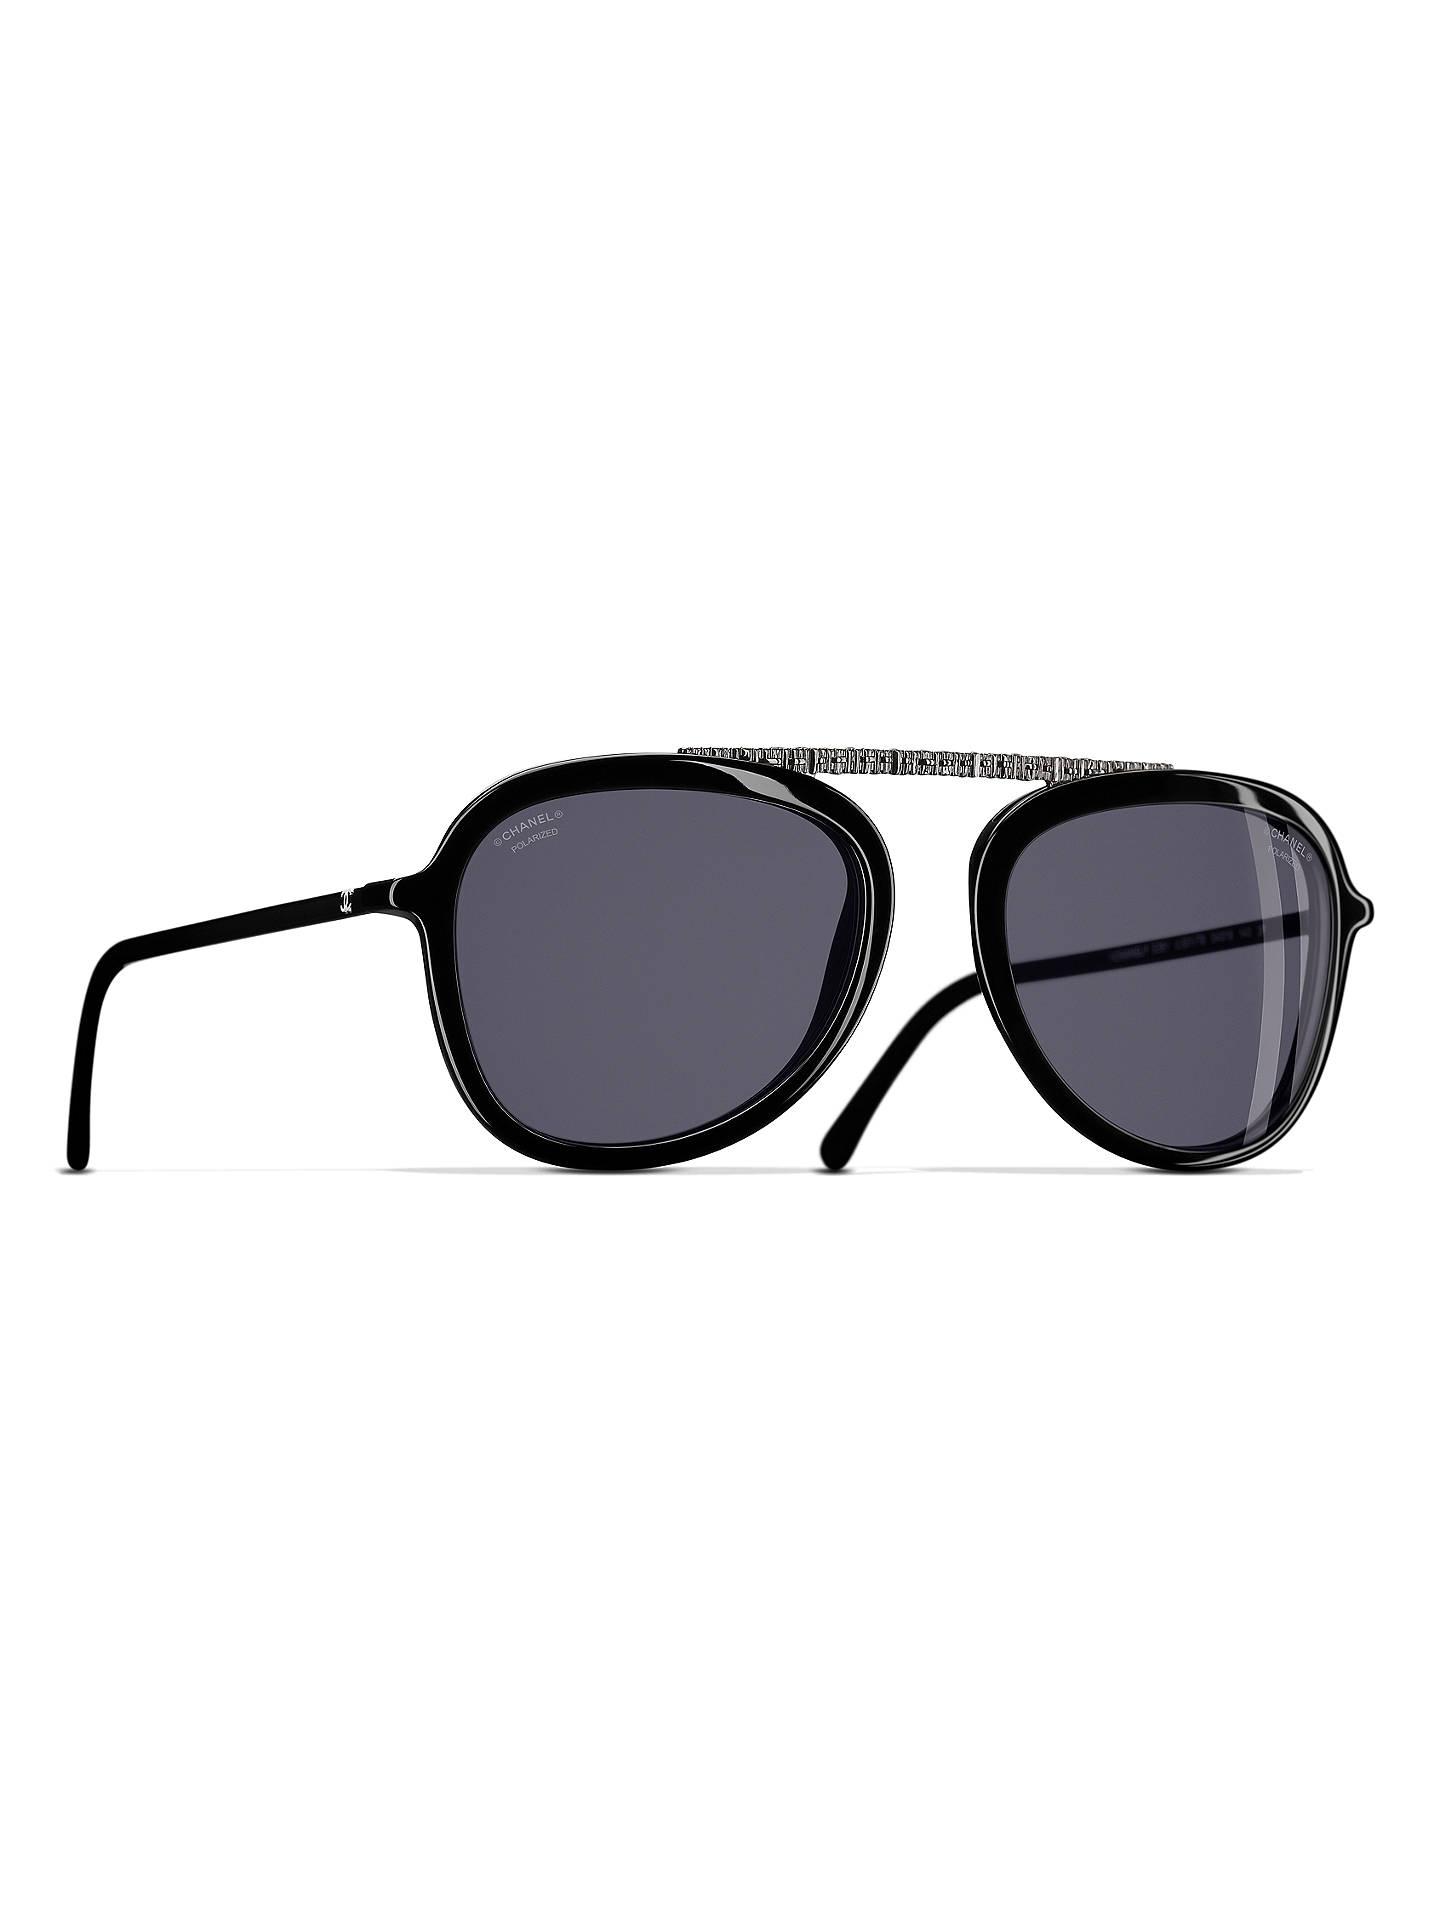 c3c97681a0 Buy CHANEL Polarised Pilot Sunglasses CH5381 Black Online at johnlewis.com  ...